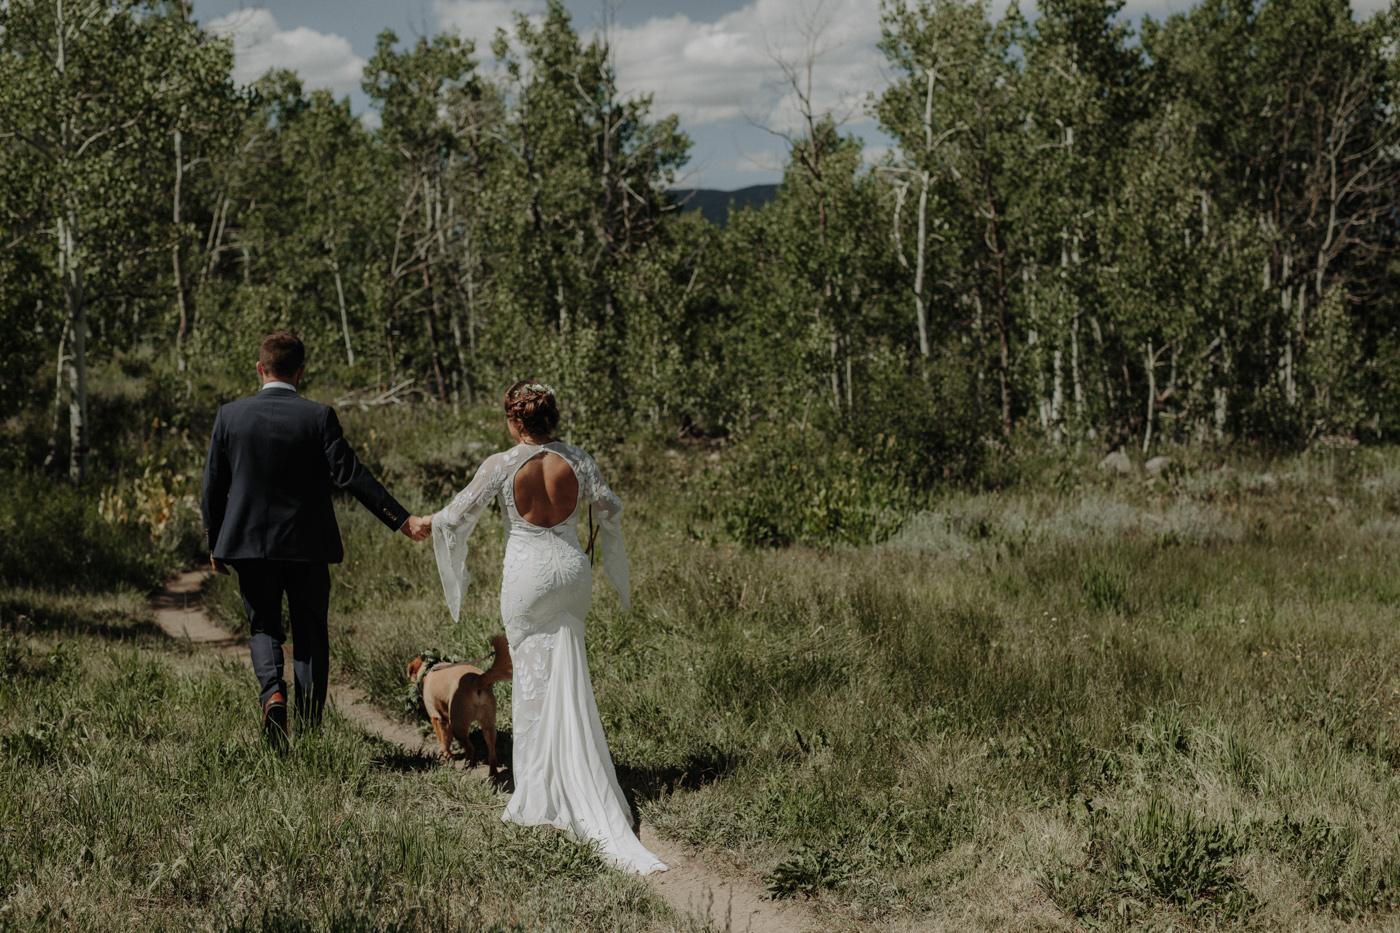 woods-walk-trail-crested-butte-colorado-wedding-60.jpg